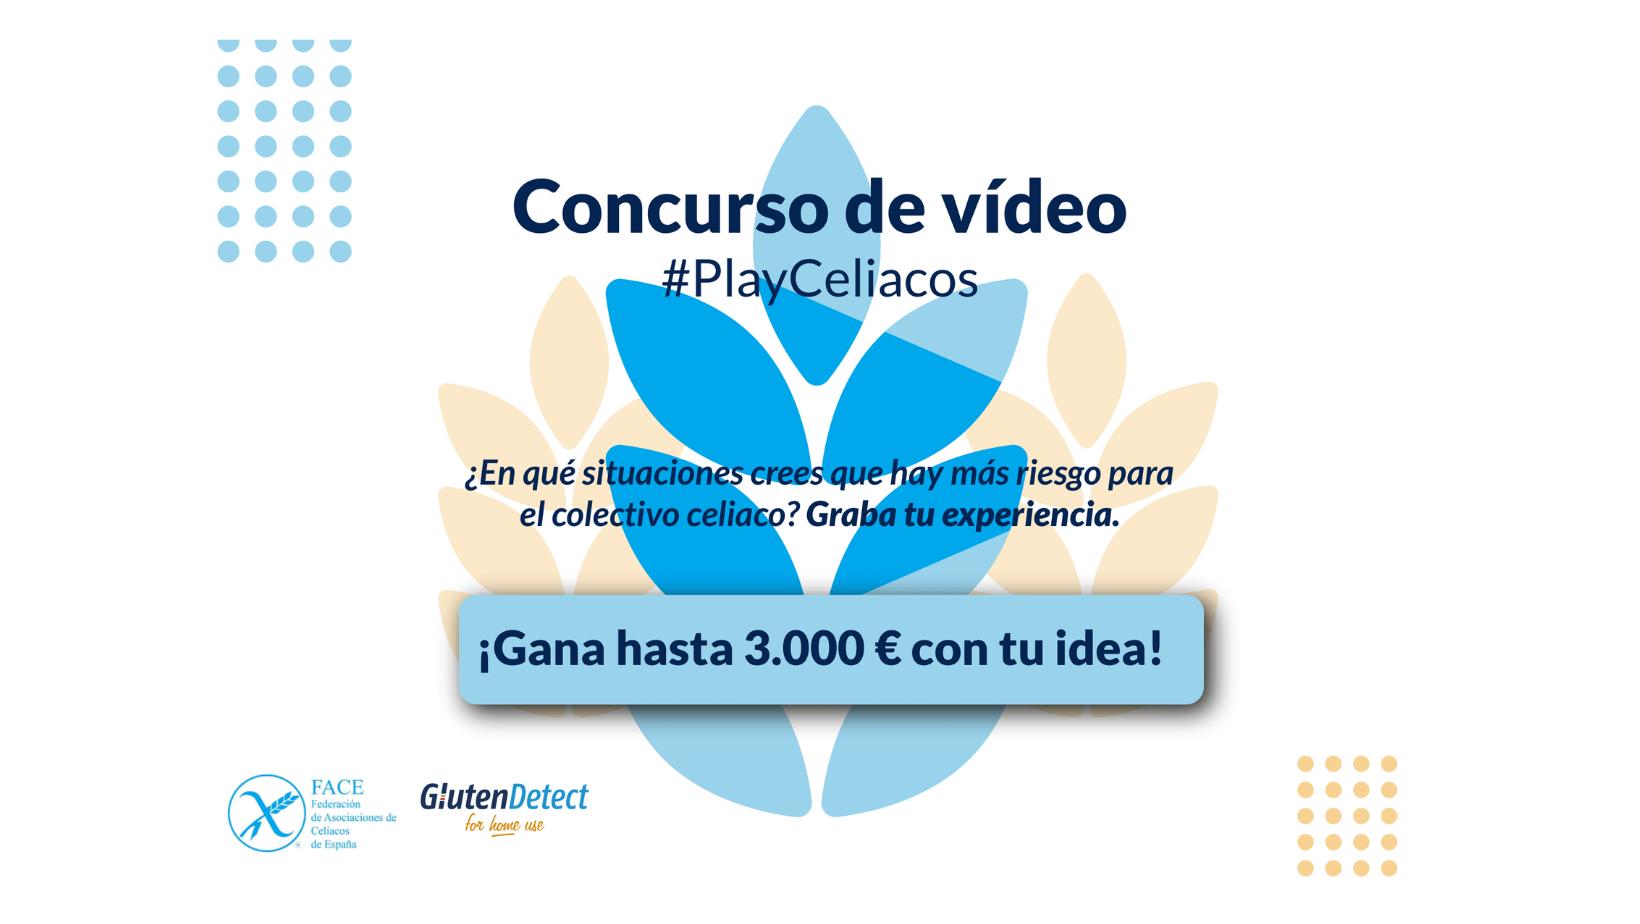 PlayCeliacos contest